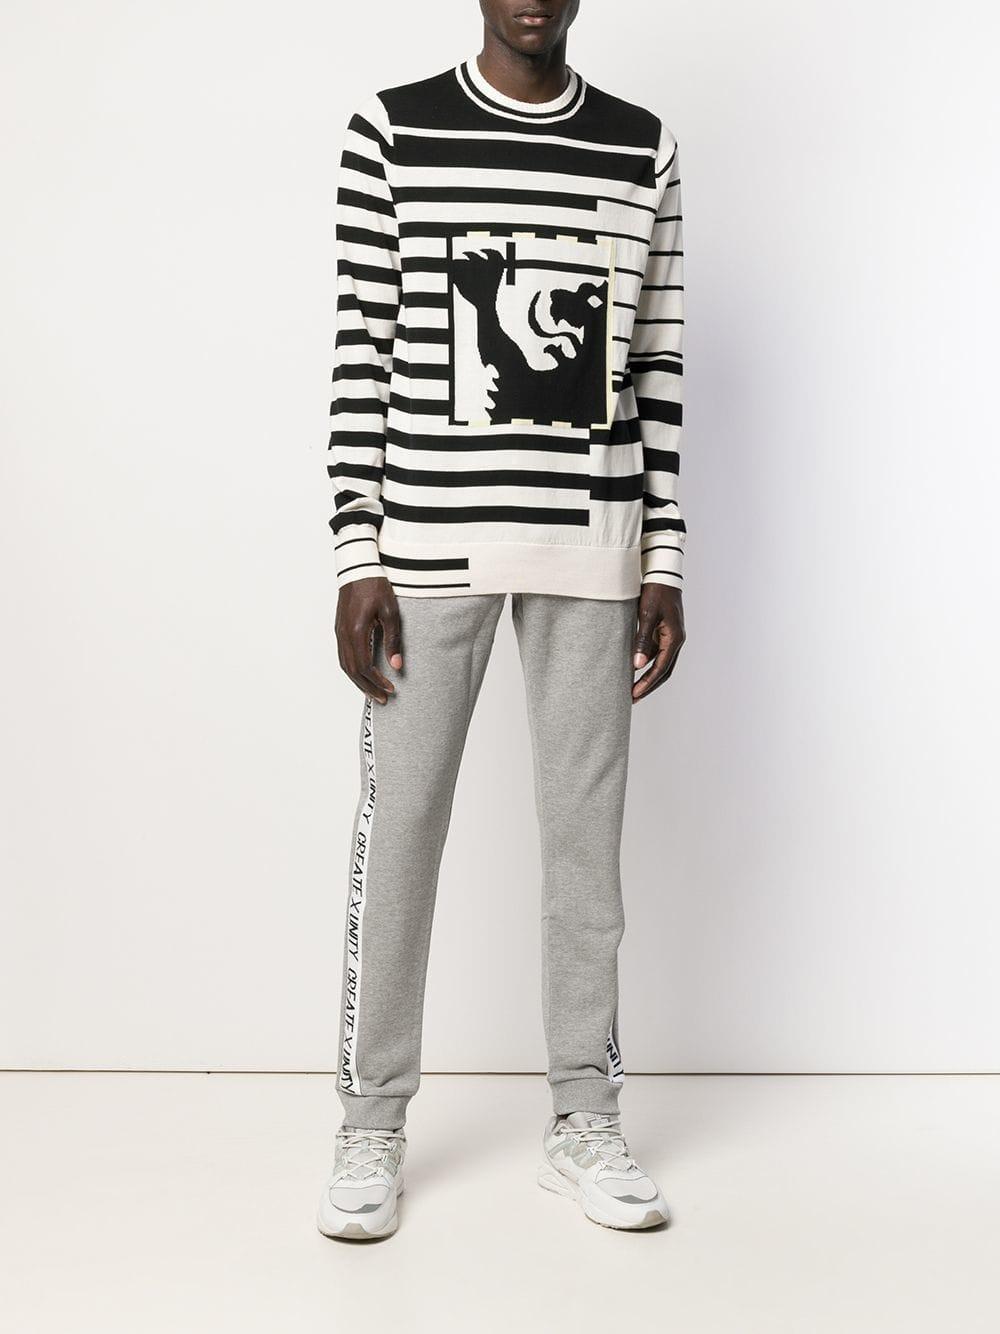 4bf2ba58ac7 Lyst - Pantalones de chándal con logo Tommy Hilfiger de hombre de color Gris